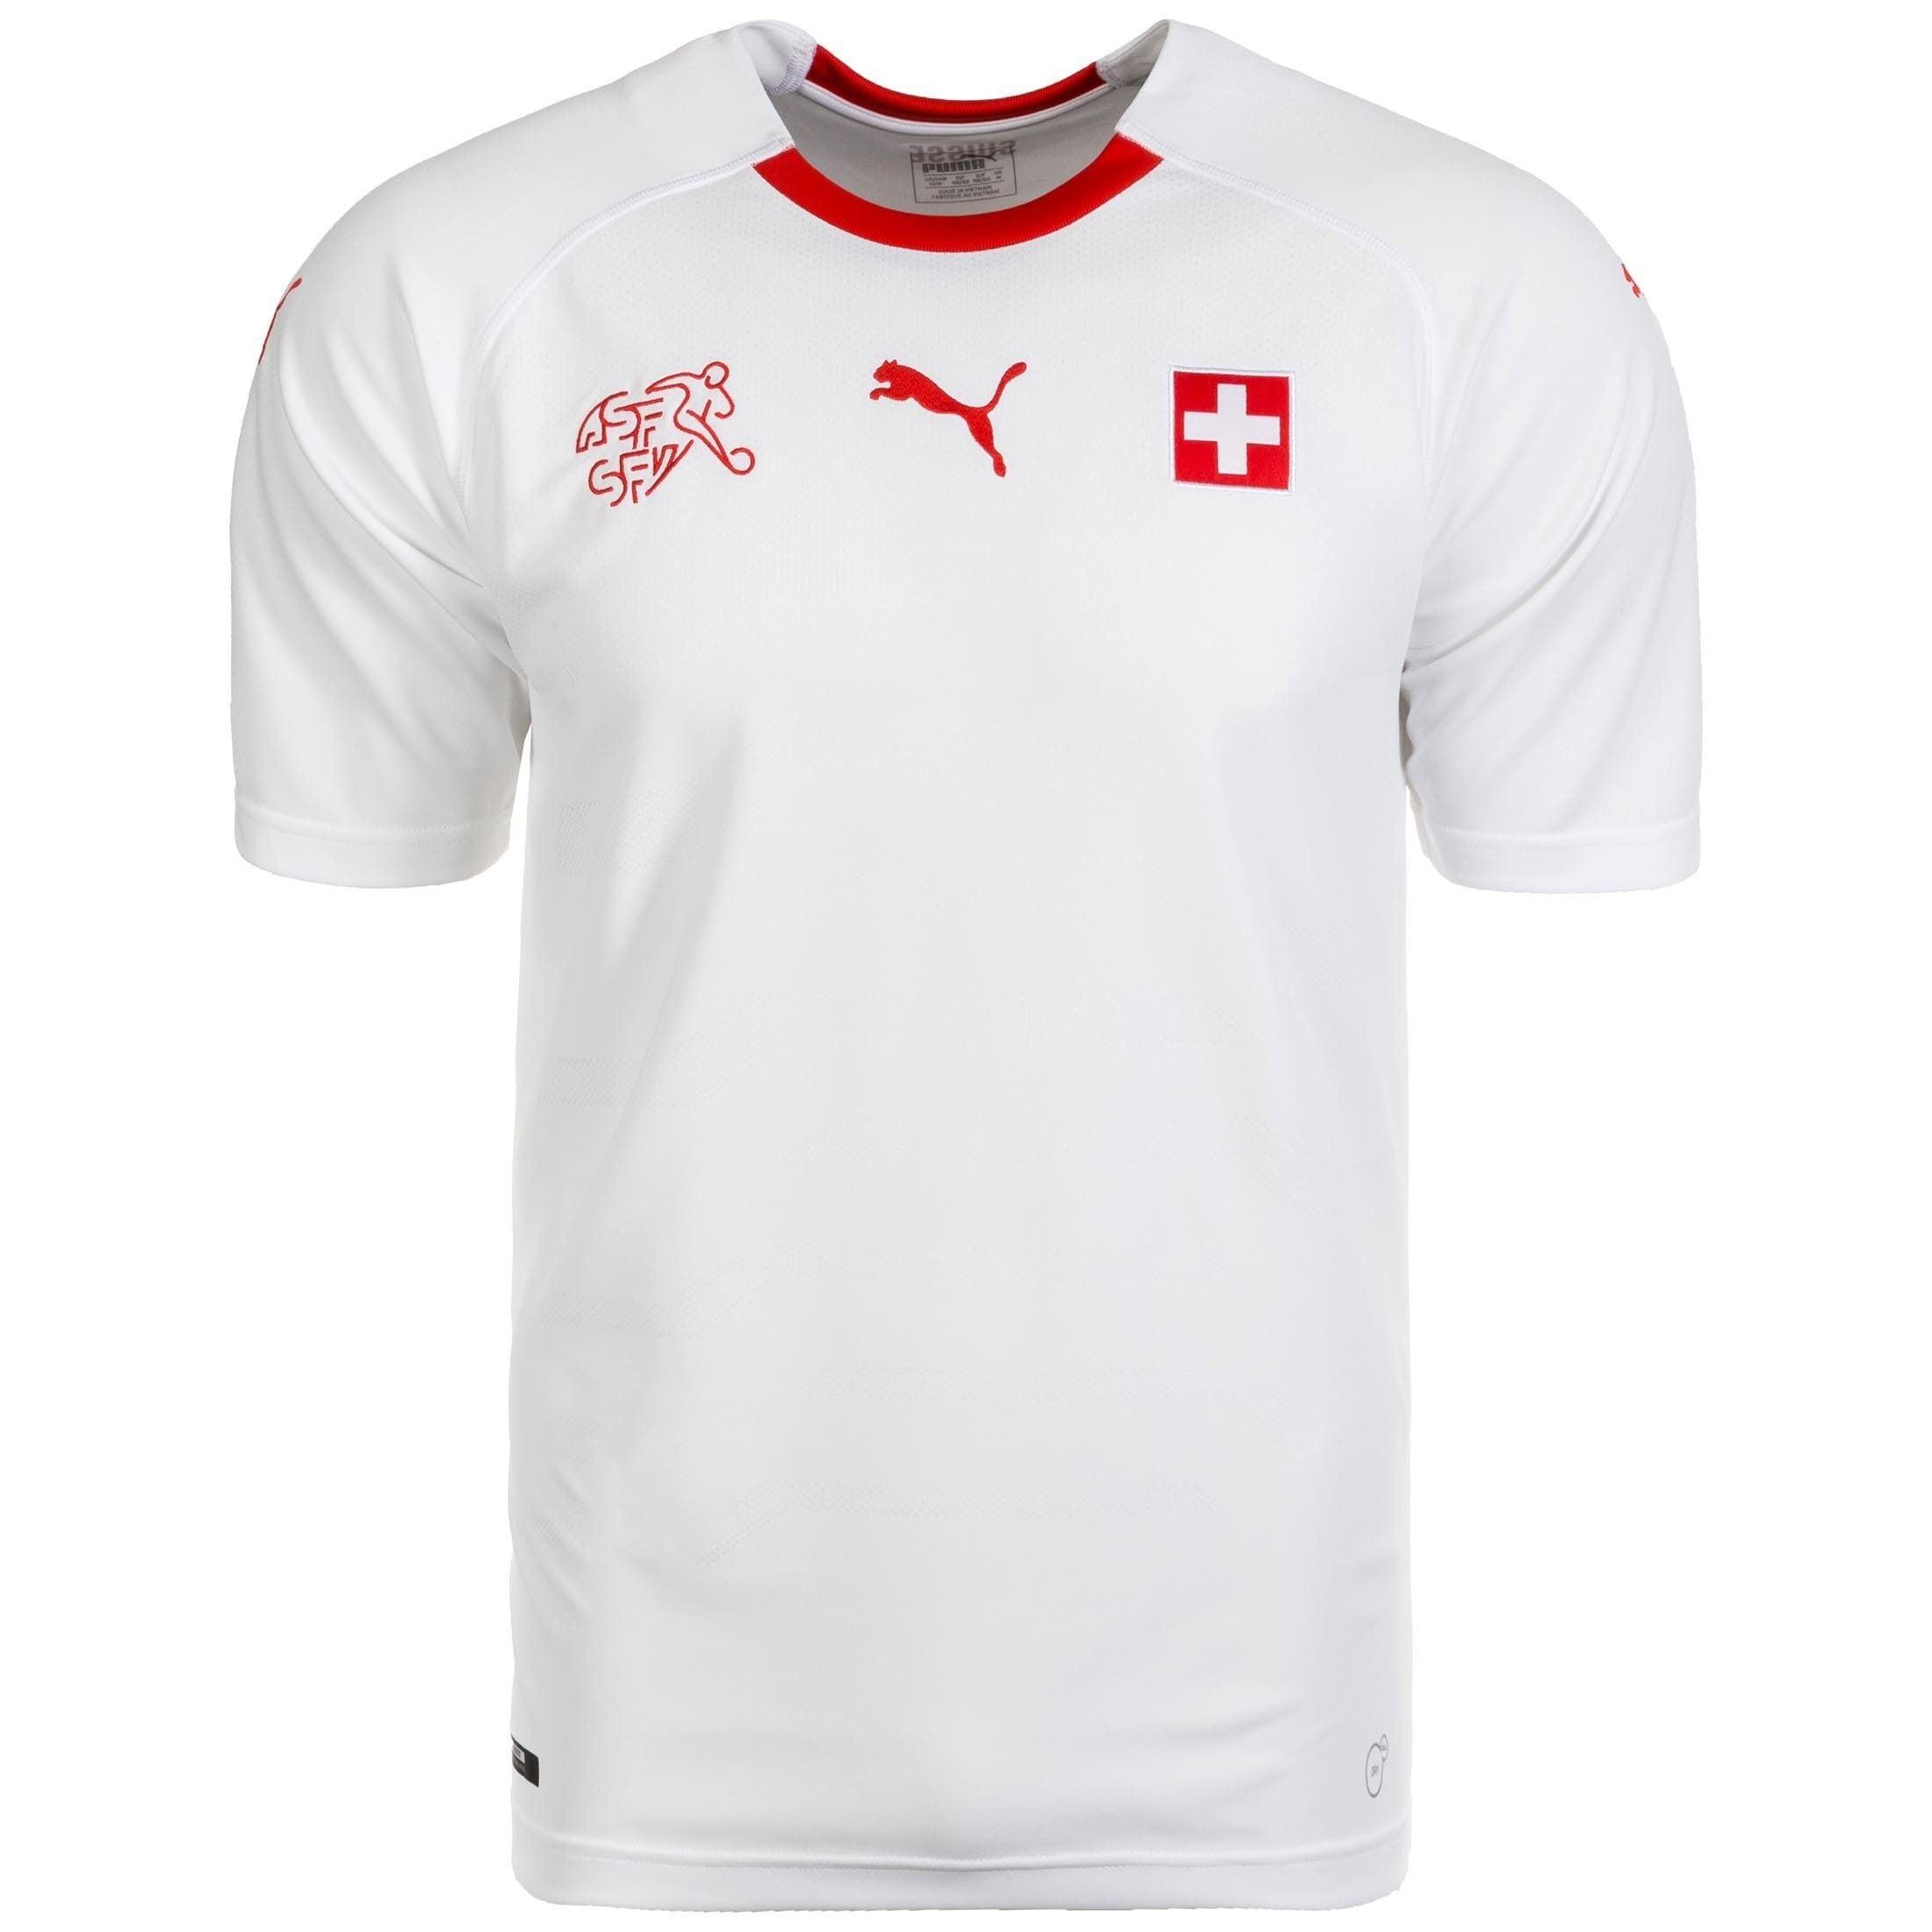 PUMA Fußballtrikot Schweiz 2018 Auswärts   Sportbekleidung > Trikots > Fußballtrikots   Puma